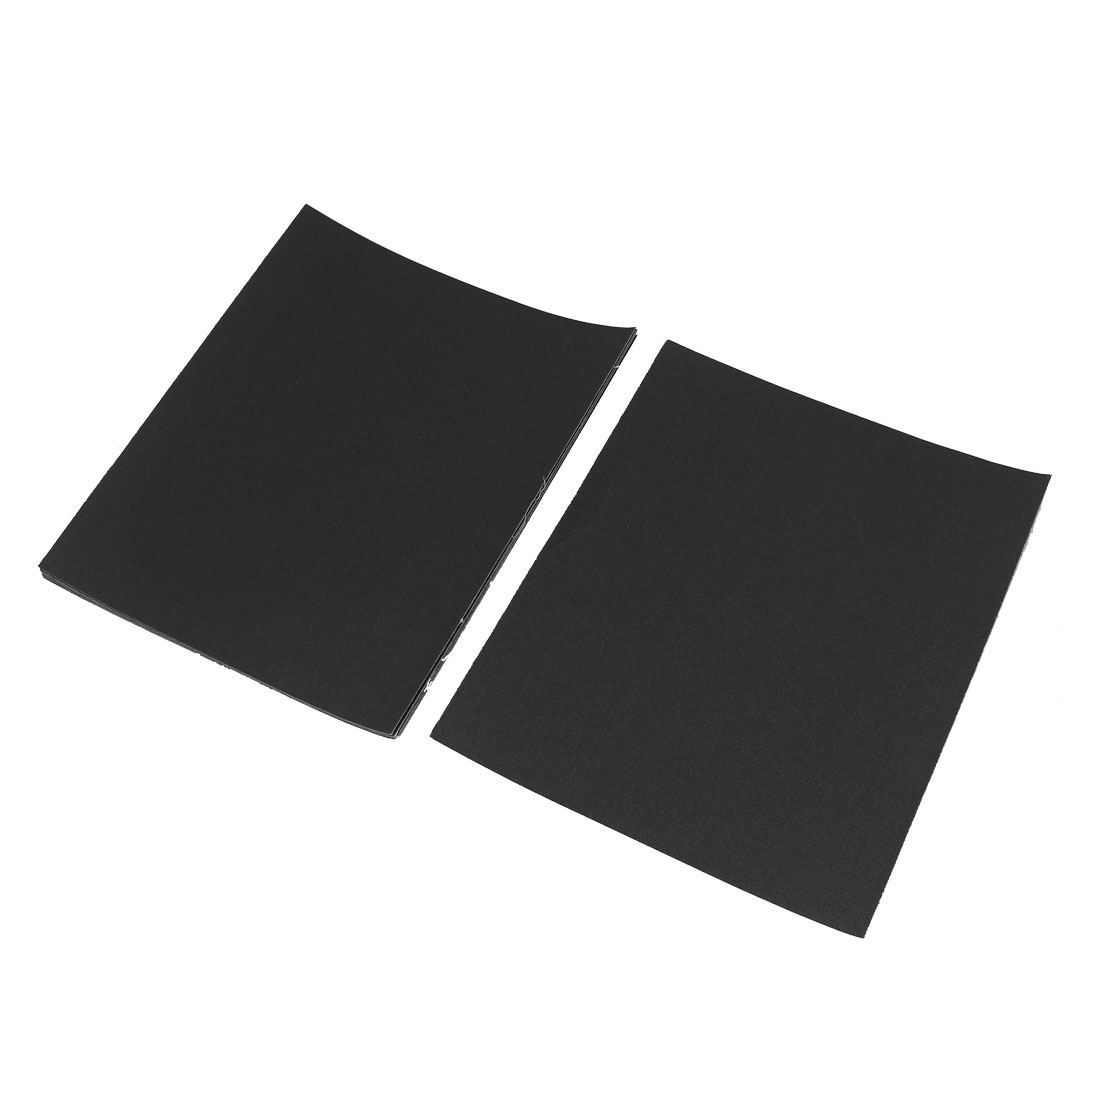 Grinding Square Abrasive Sanding Sandpaper Sheets 180 Grit 10 Pcs